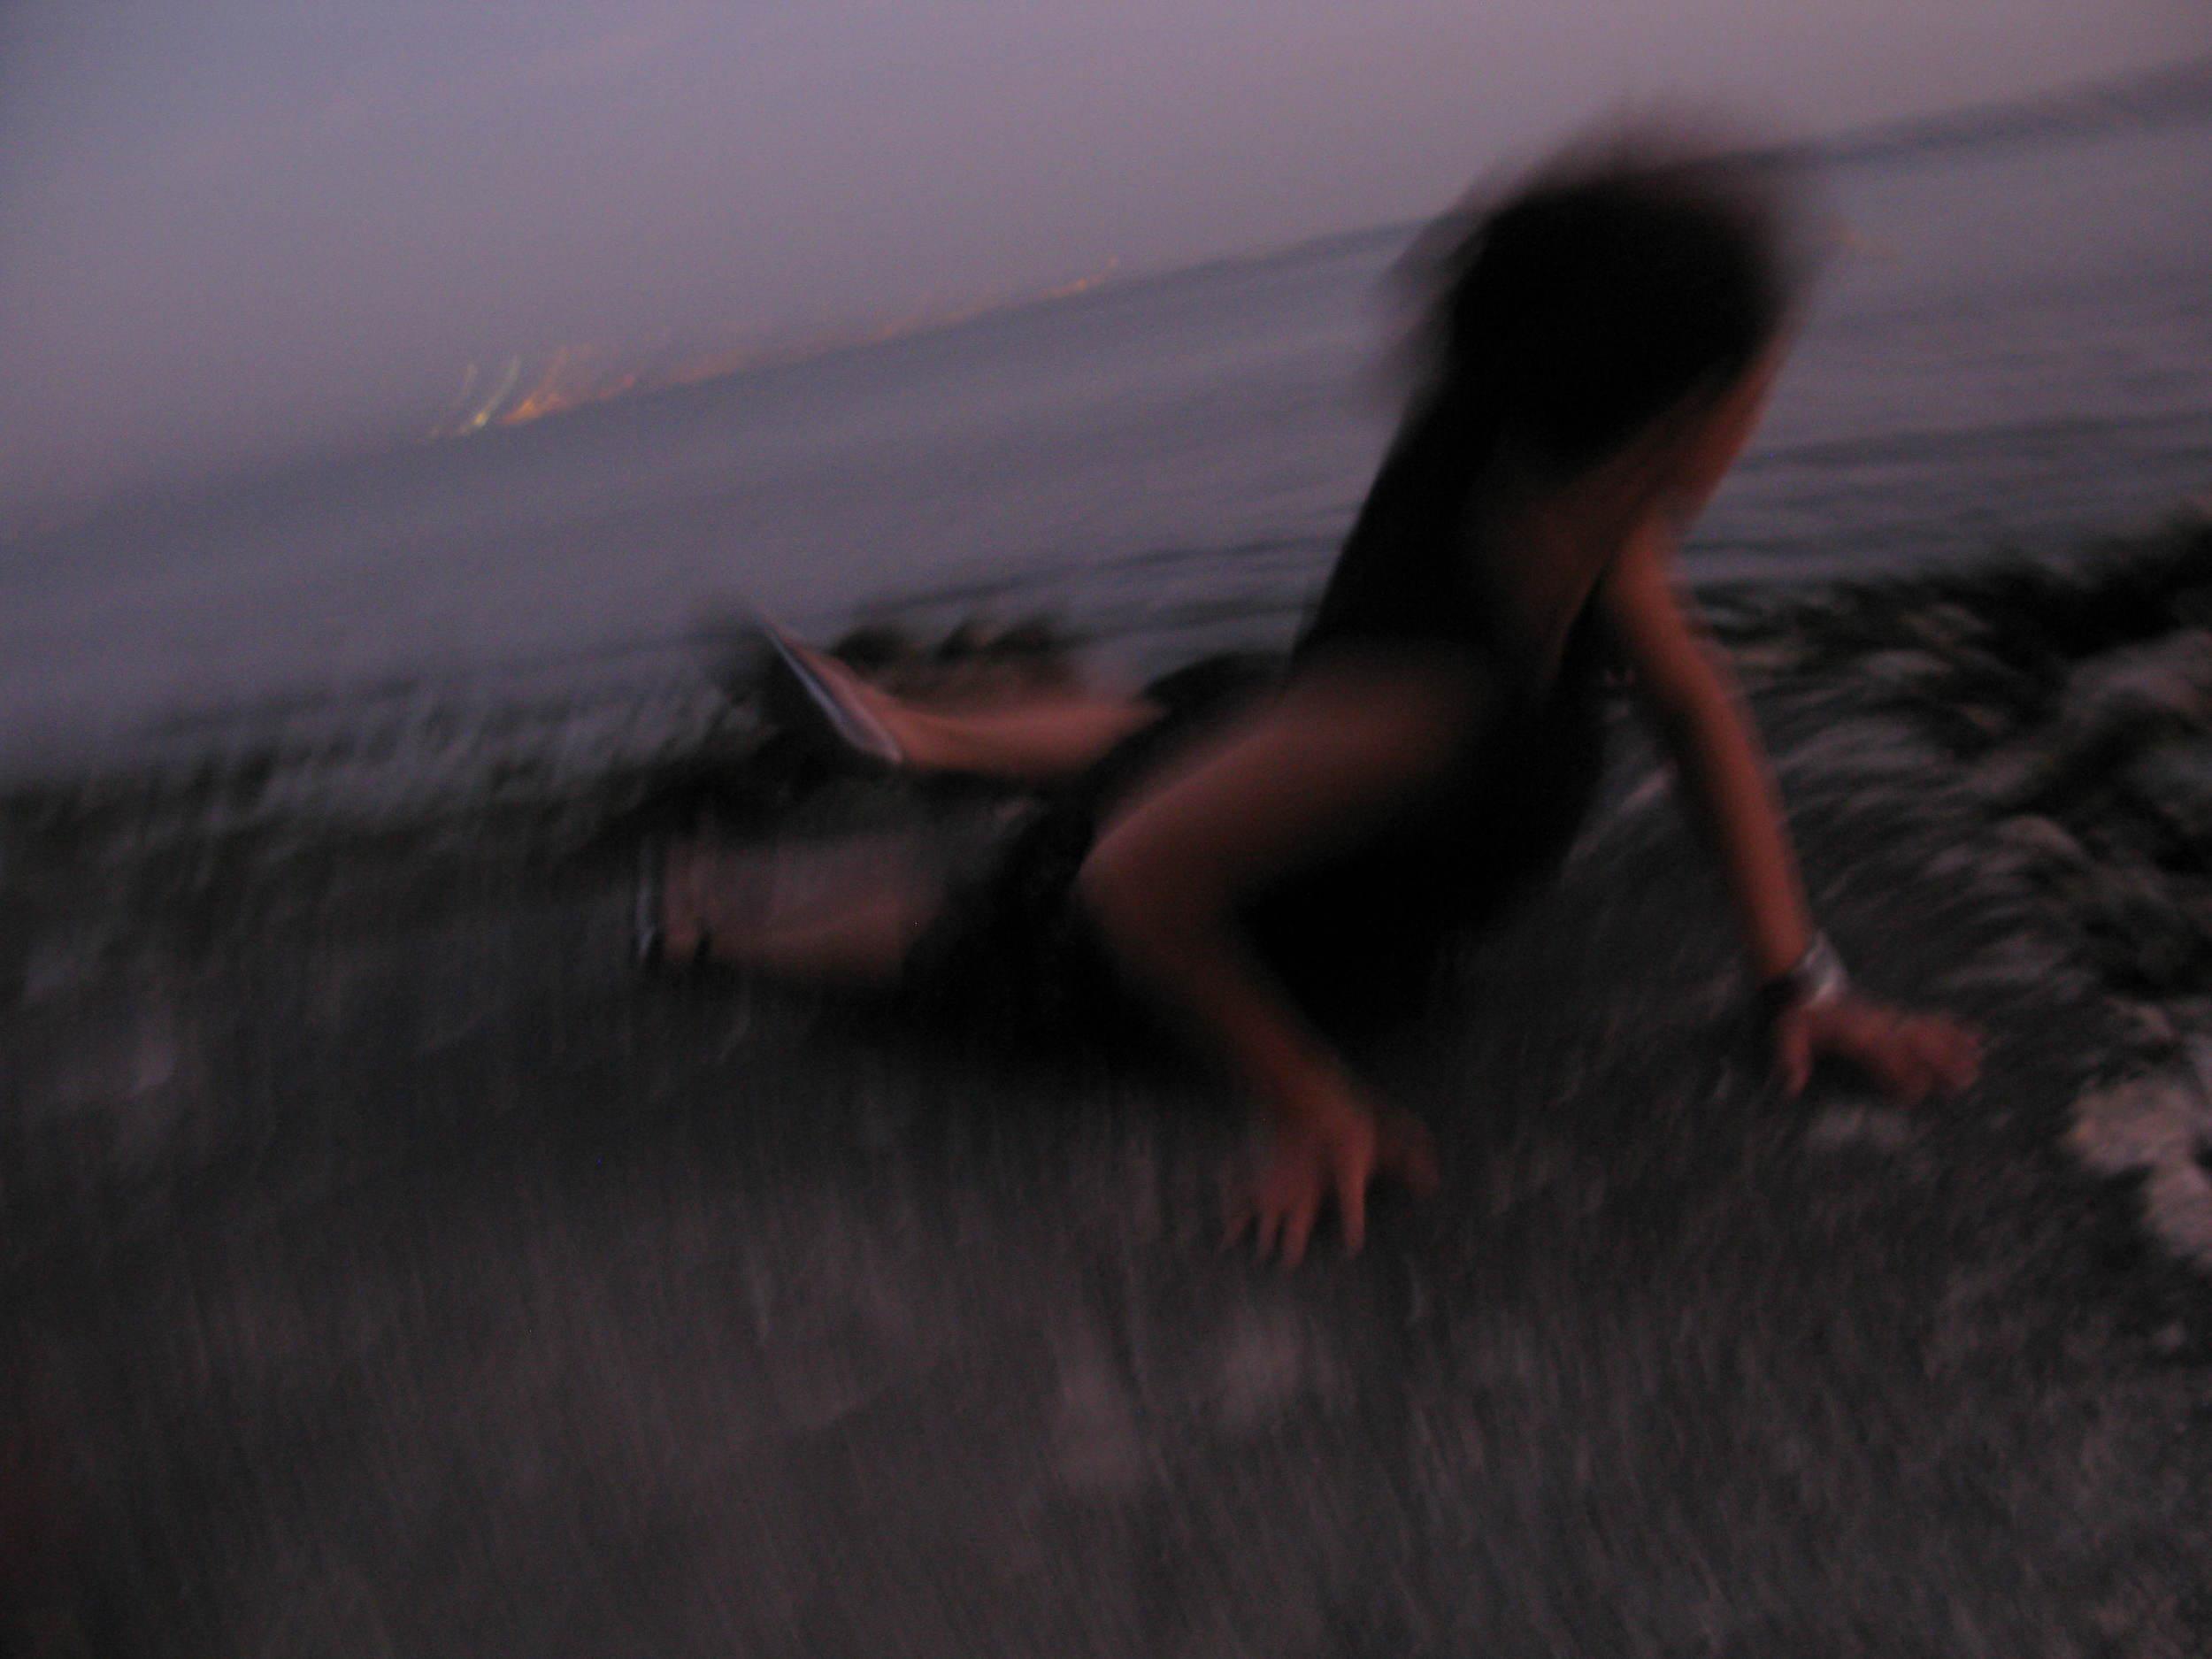 Body of Time 5, Sofia Varino, Photography, 12 x 15, $100.jpg